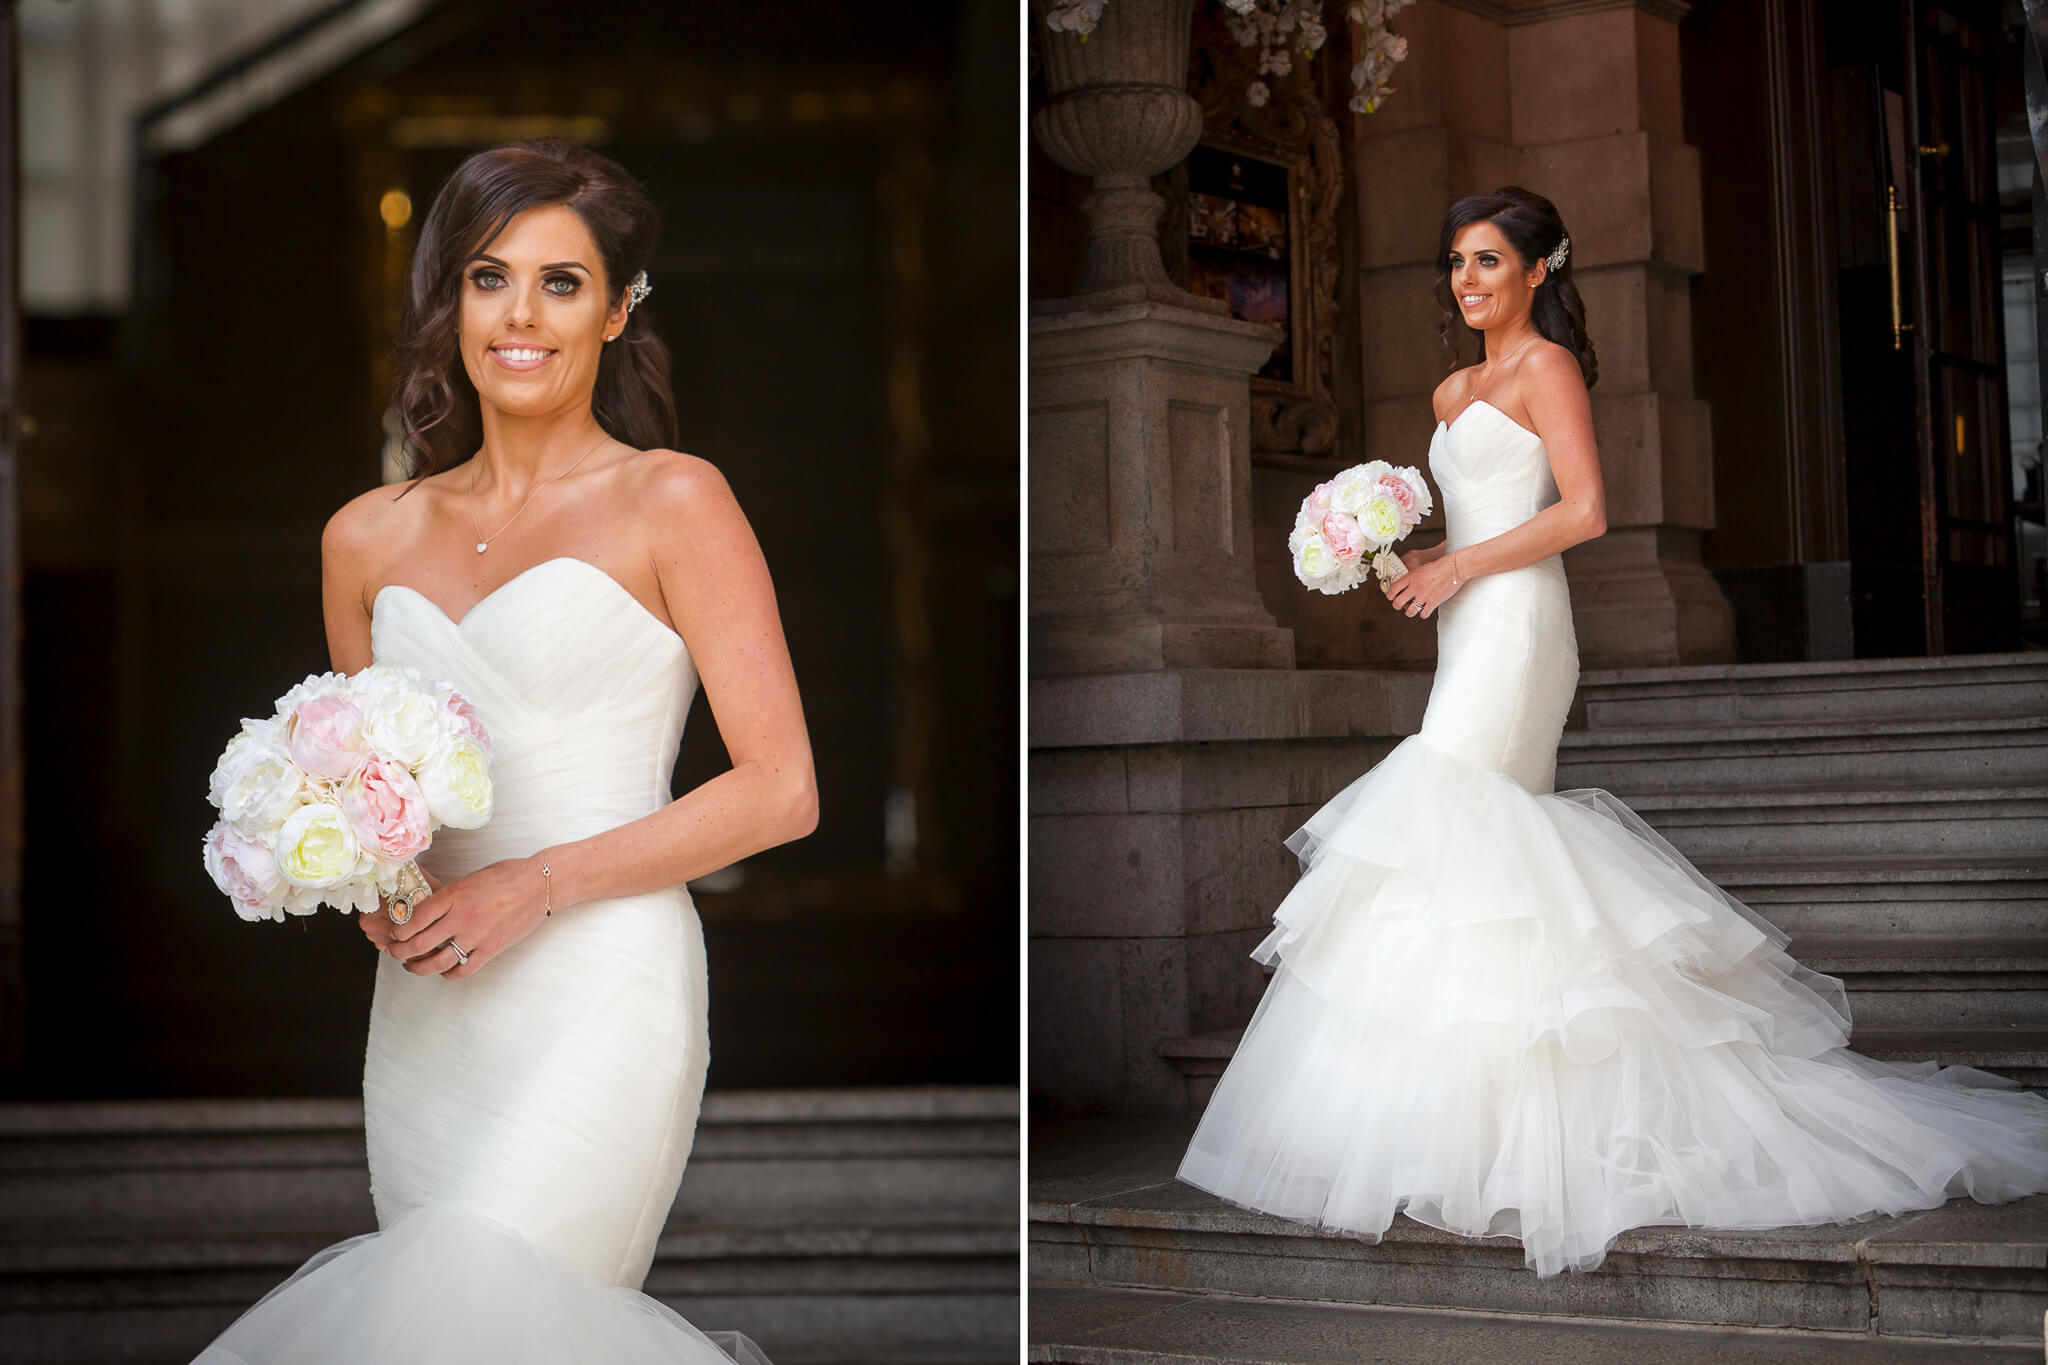 bride-flowers-weddingdress-30-james-street-liverpool